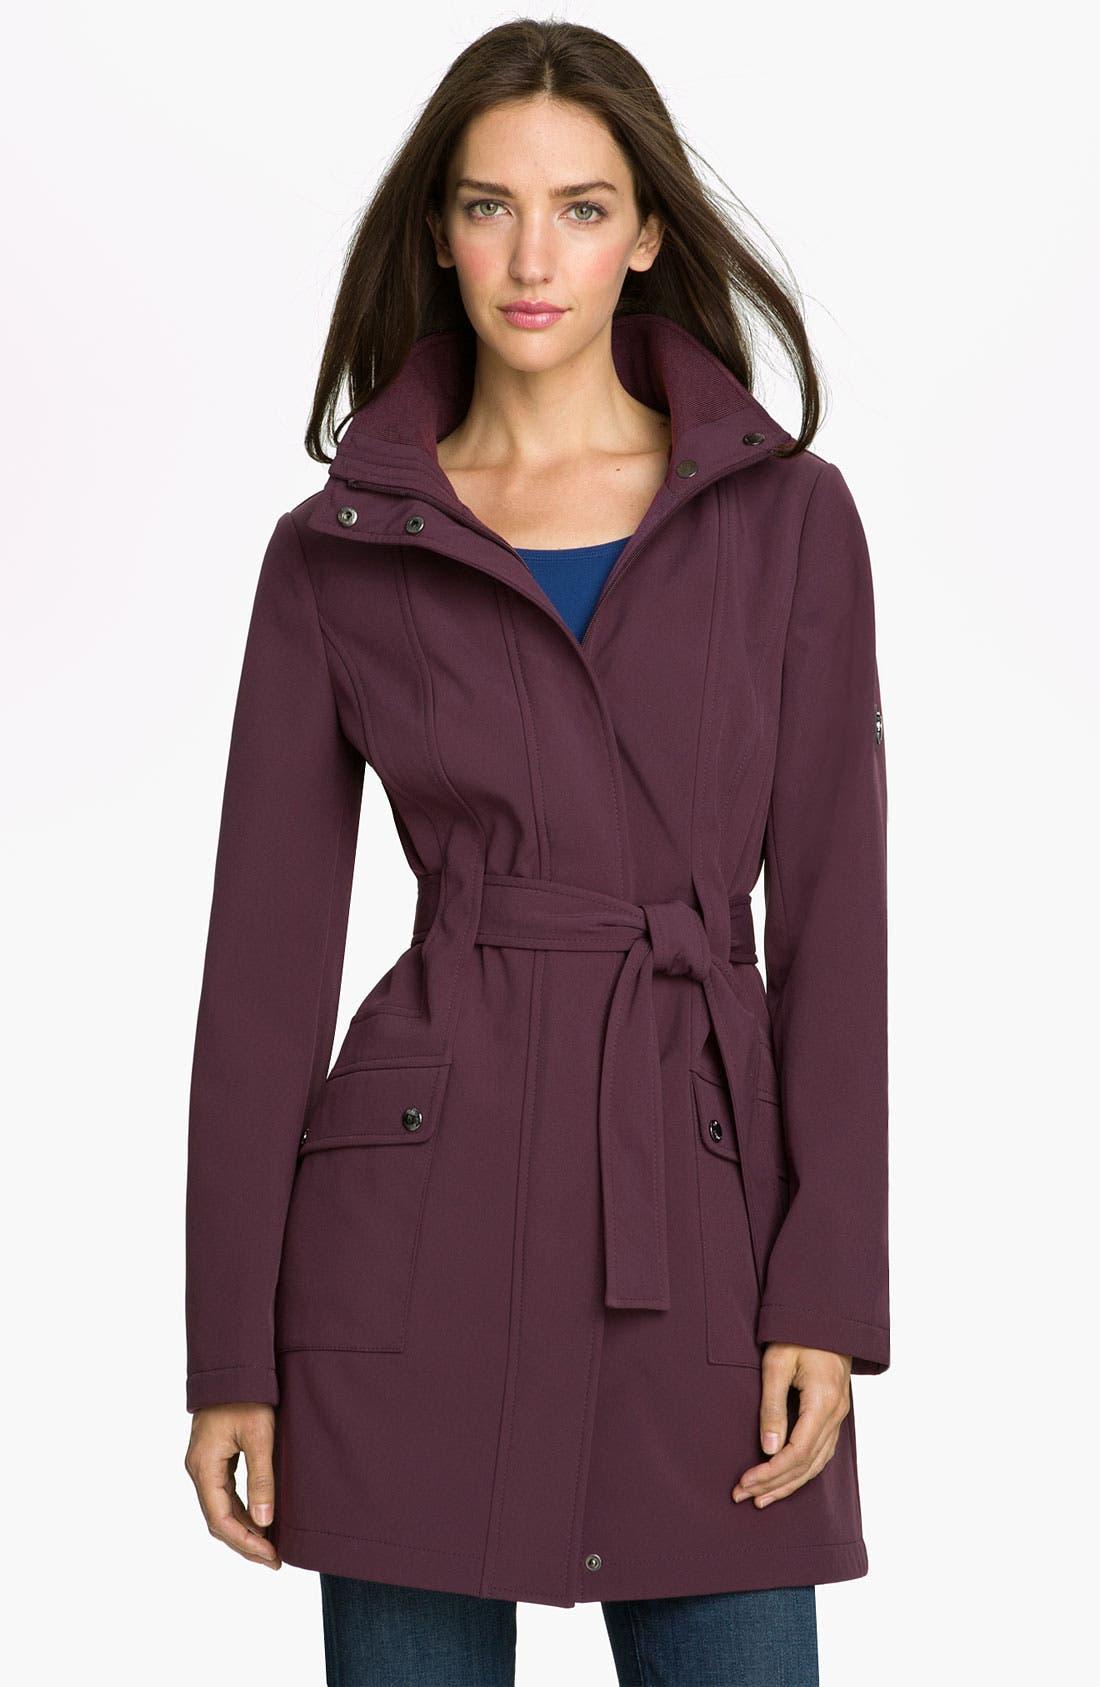 Alternate Image 1 Selected - Calvin Klein Fleece Lined Coat with Detachable Hood